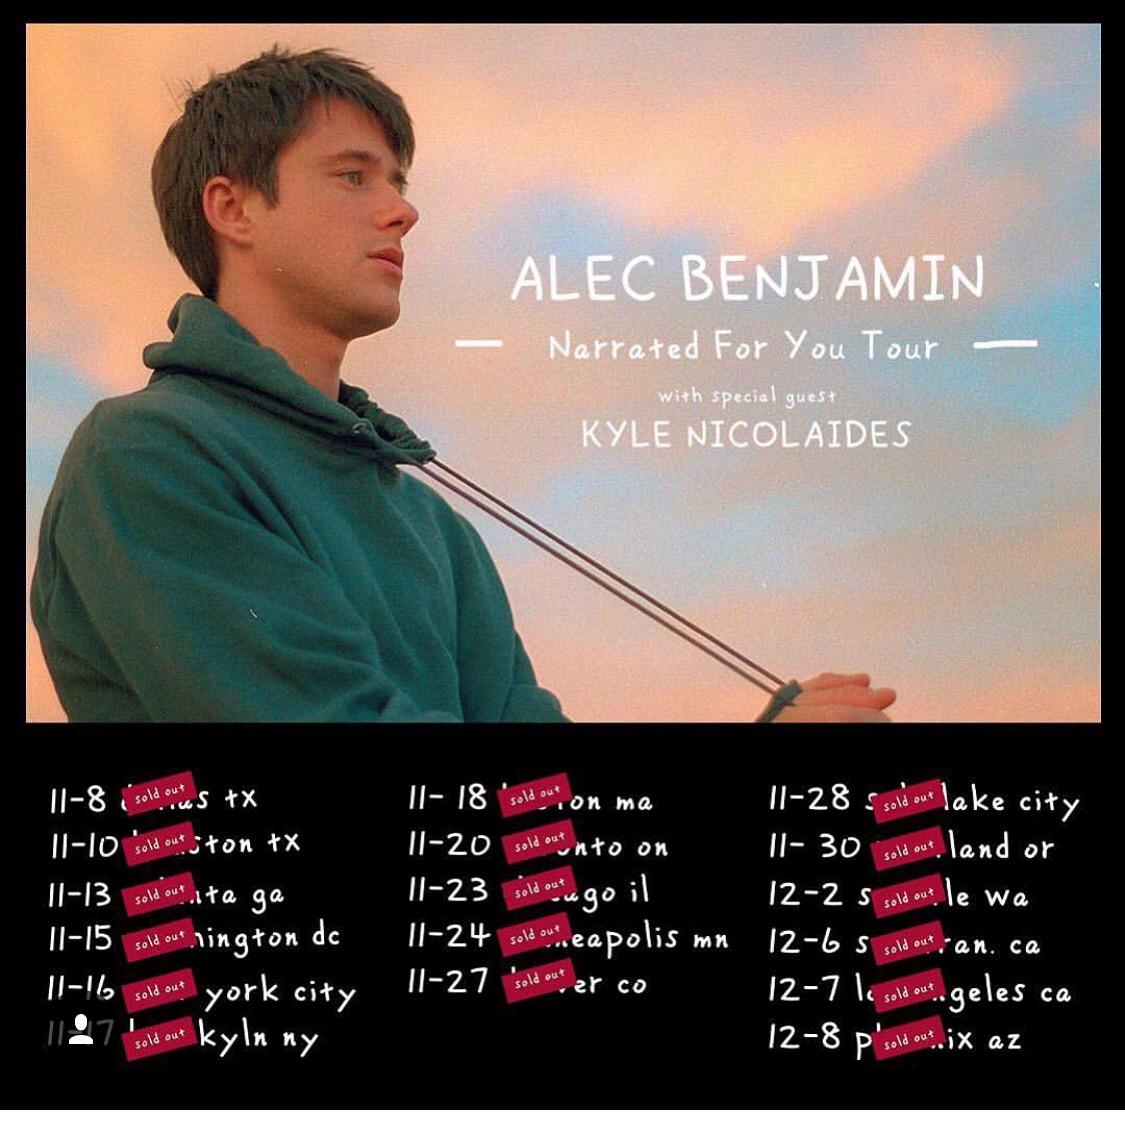 Alec Benjamin - Kyle Nicolaides tour pic.JPG